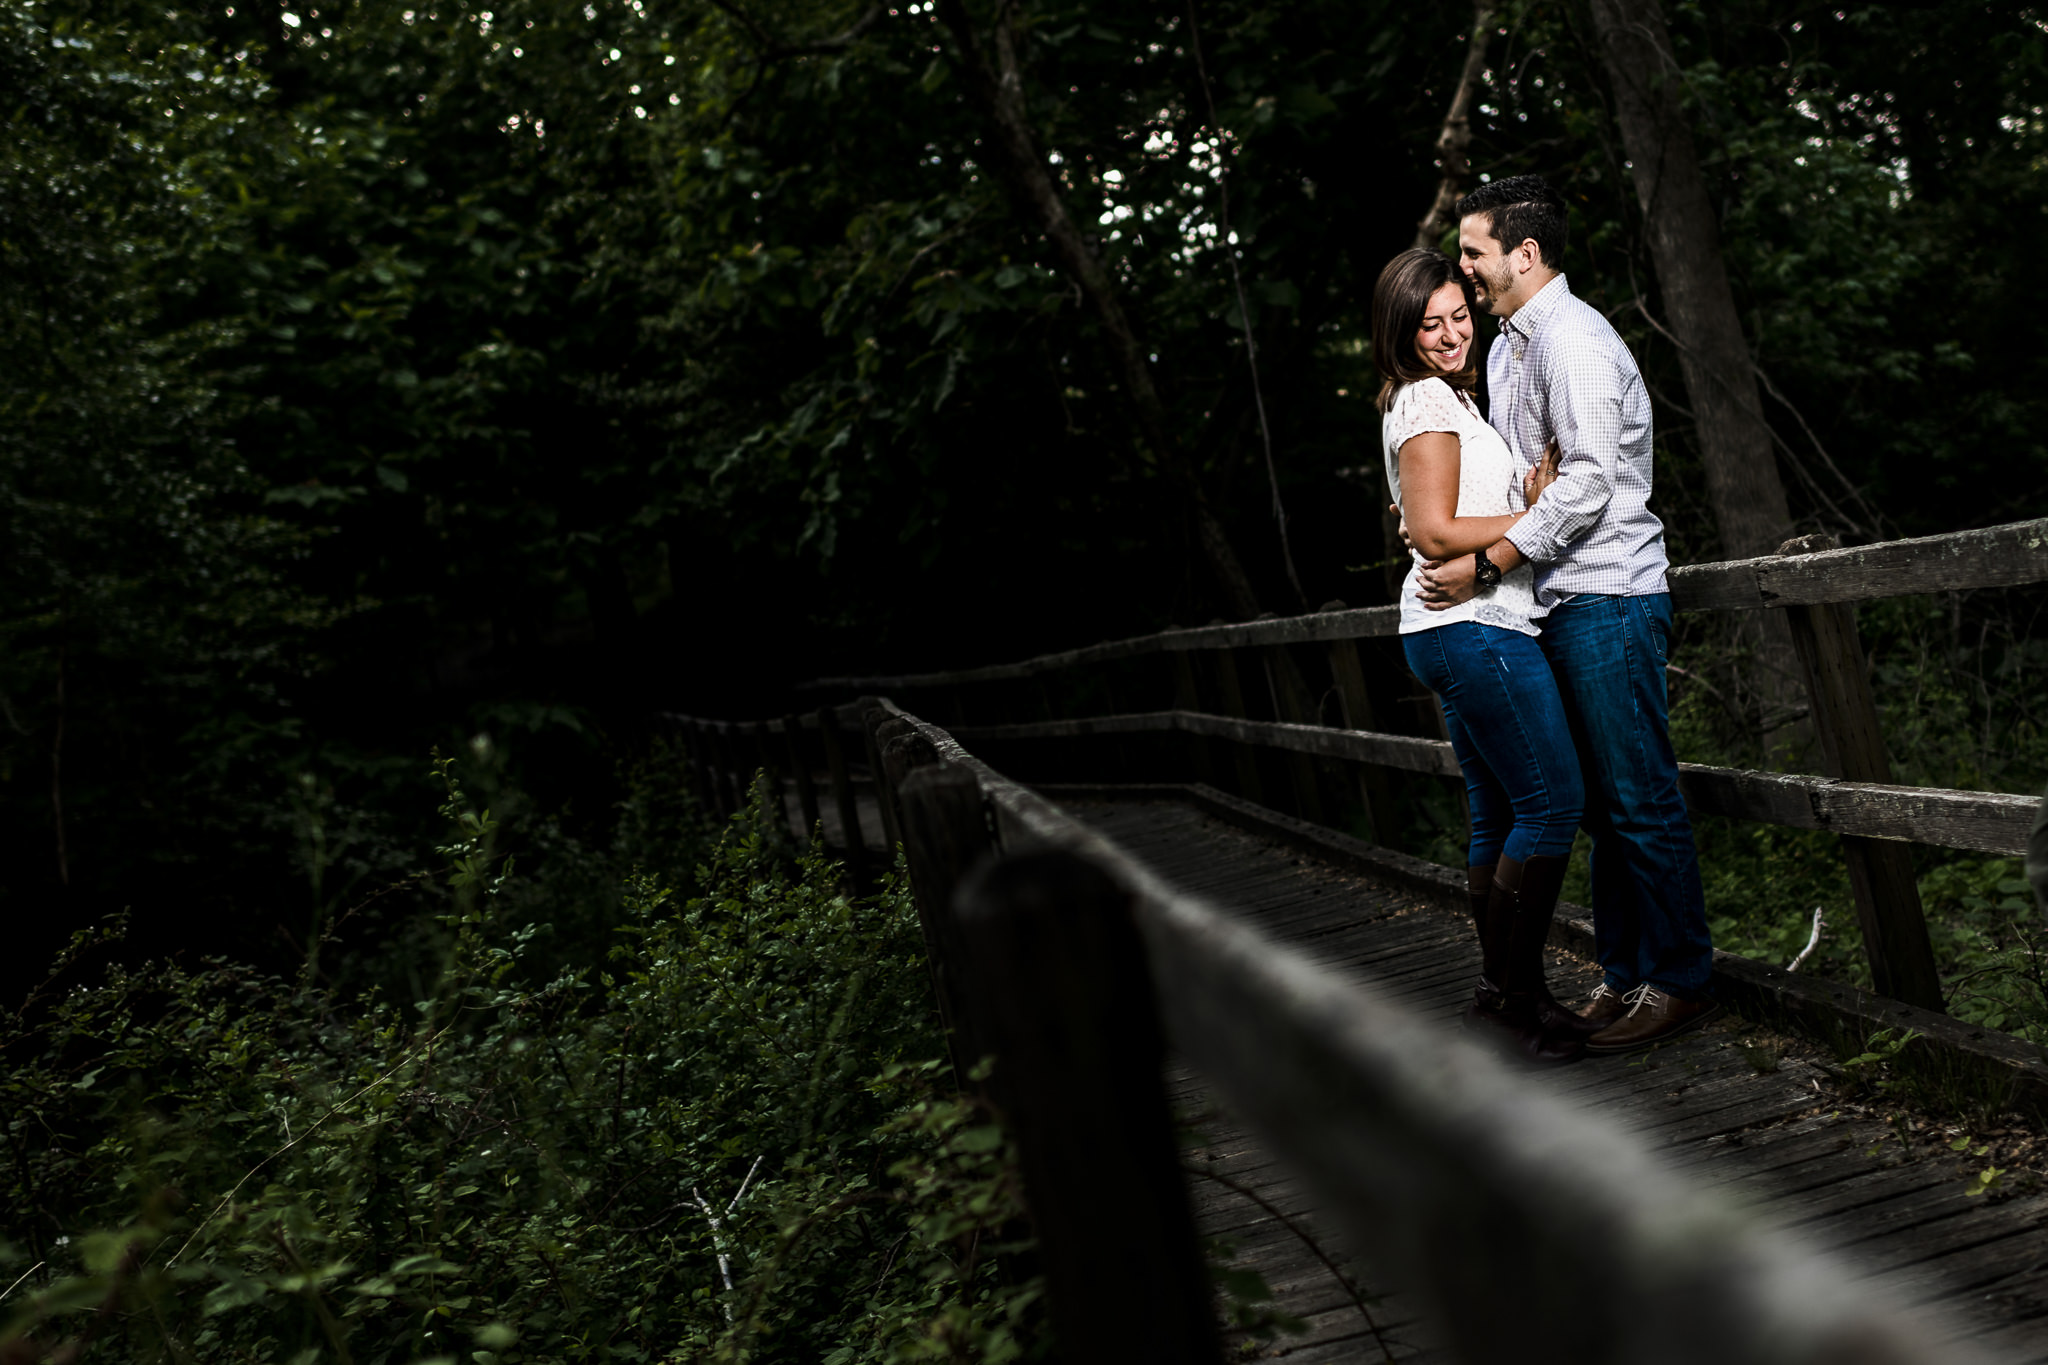 Gilbert-Allaire-State-Park-NJ-Engagement-Photos-04.JPG